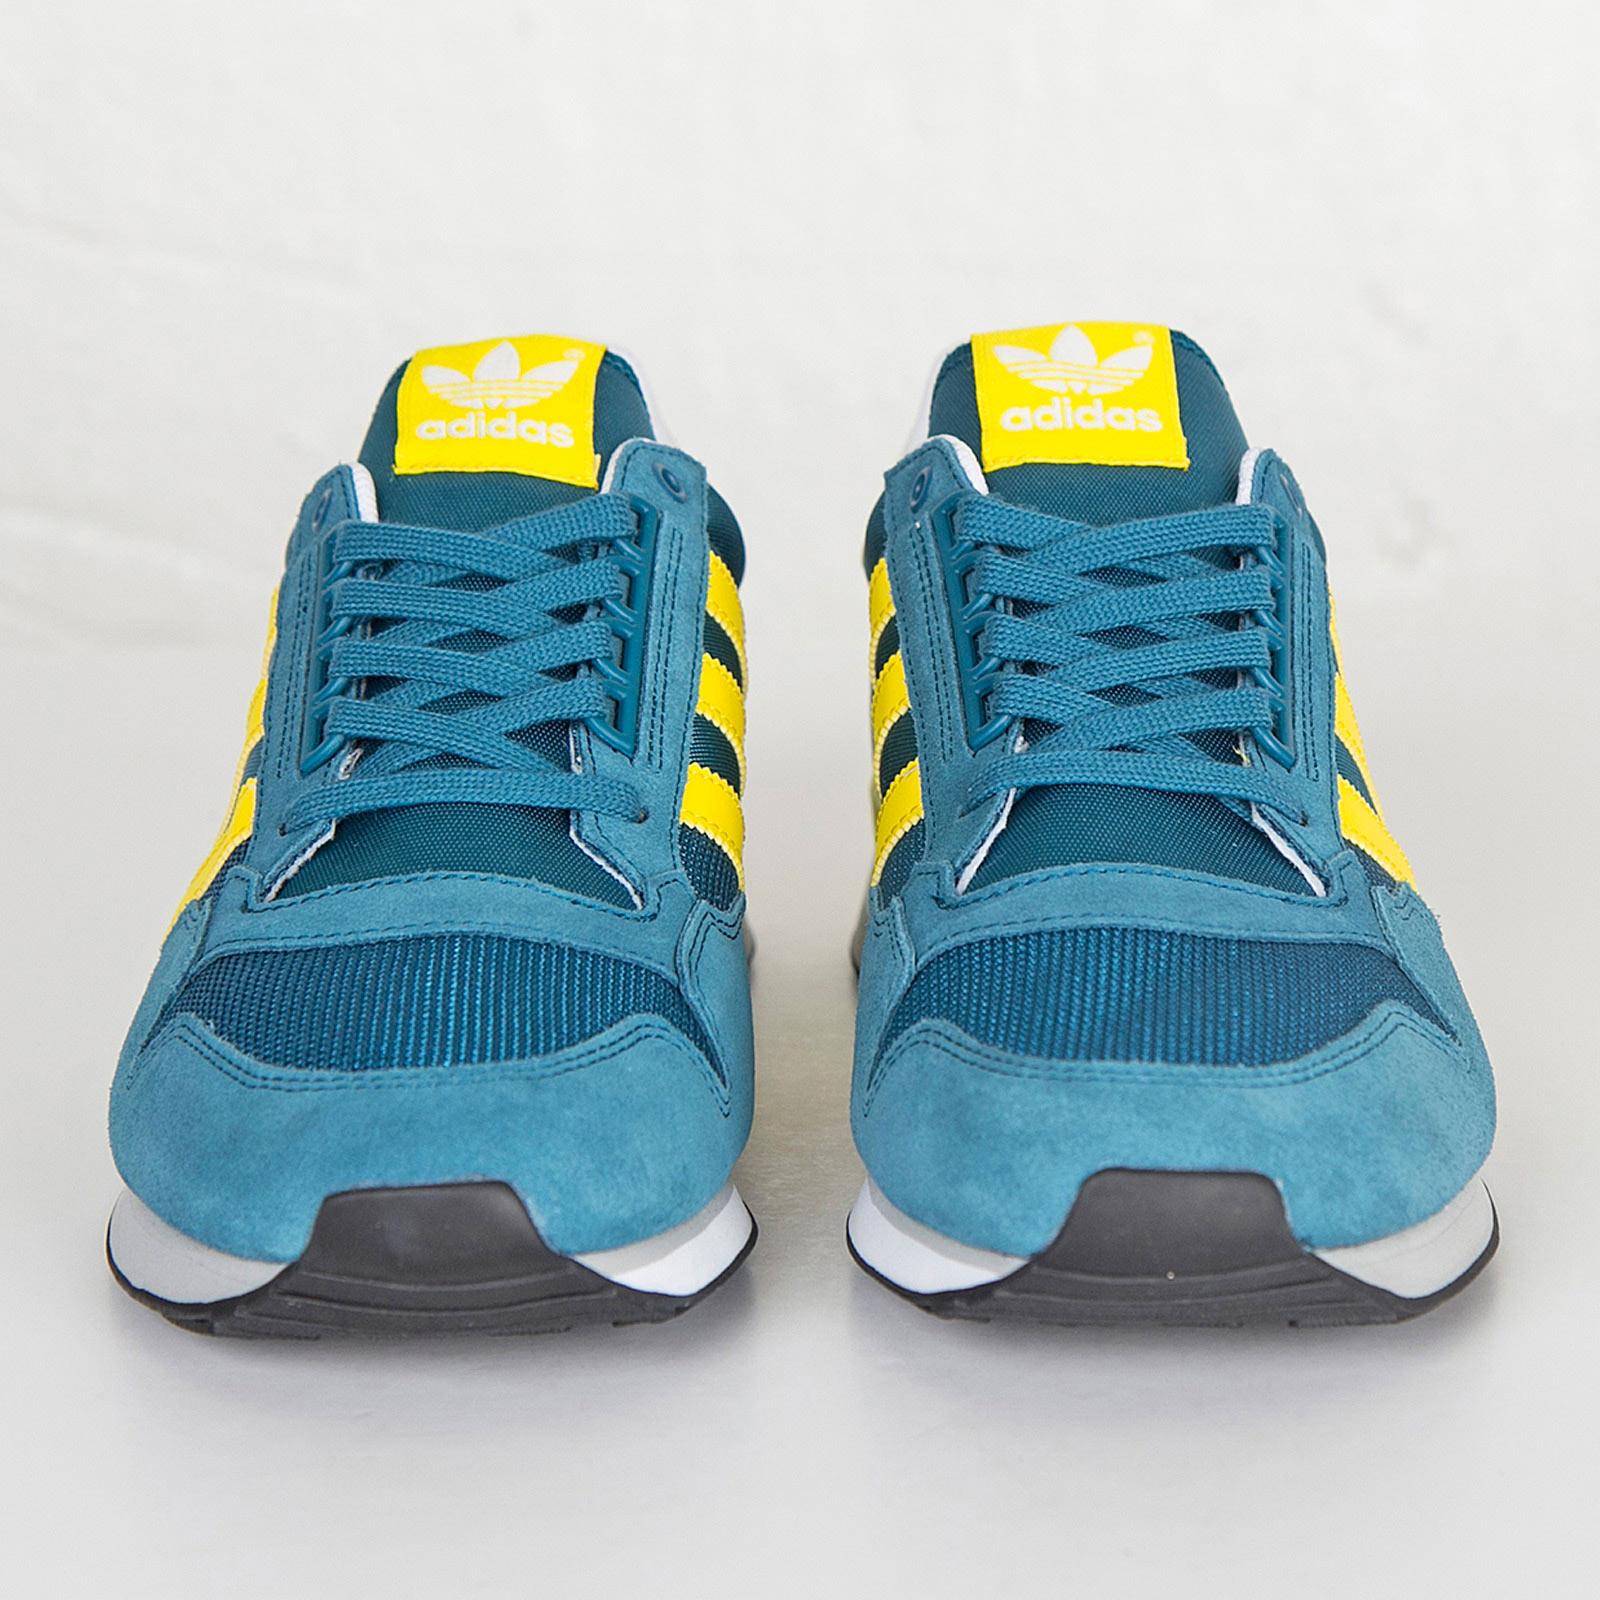 4c54044c3c116 new style adidas zx 500 og adidas zx 500 og 1fd9a 6901c